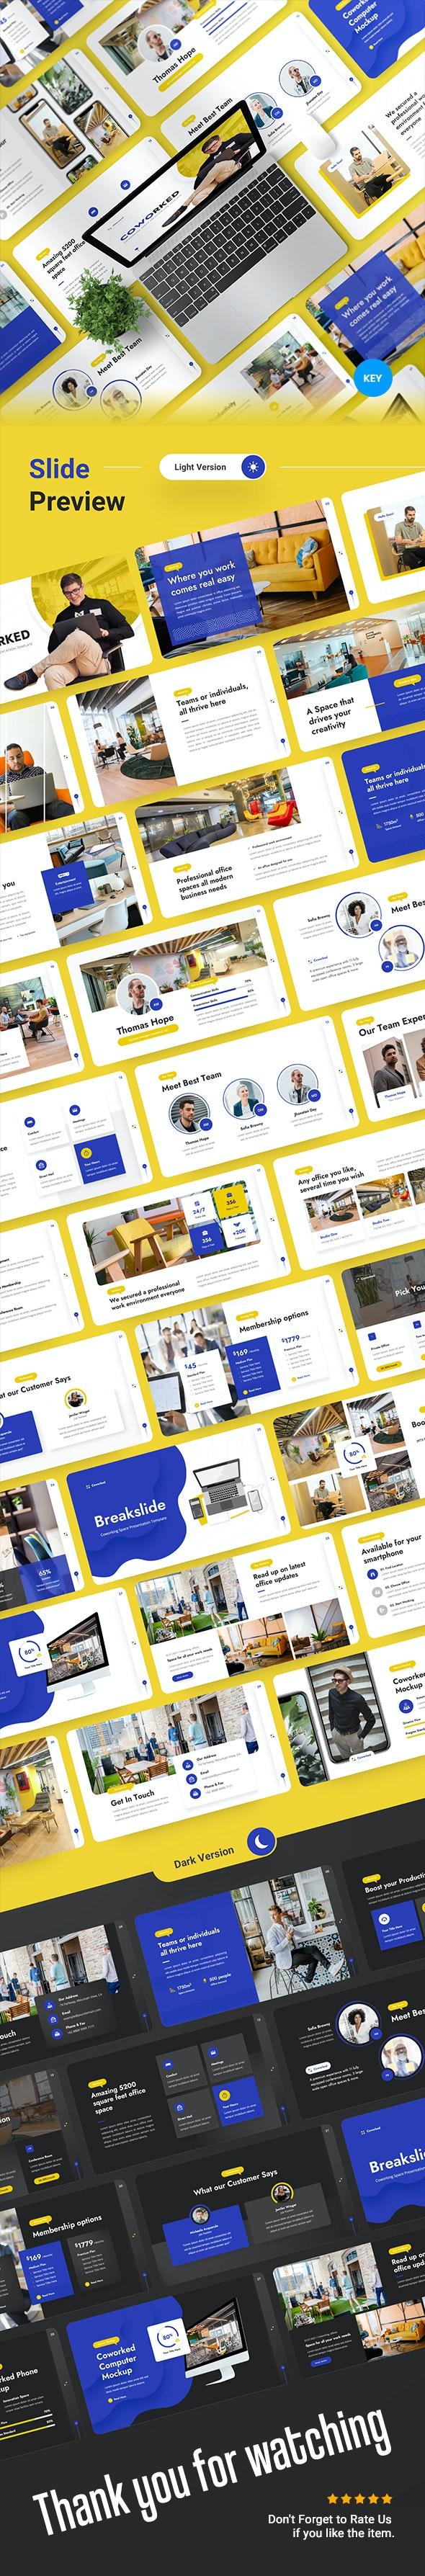 Coworked - Coworking Space Keynote Presentation Template - Business Keynote Templates